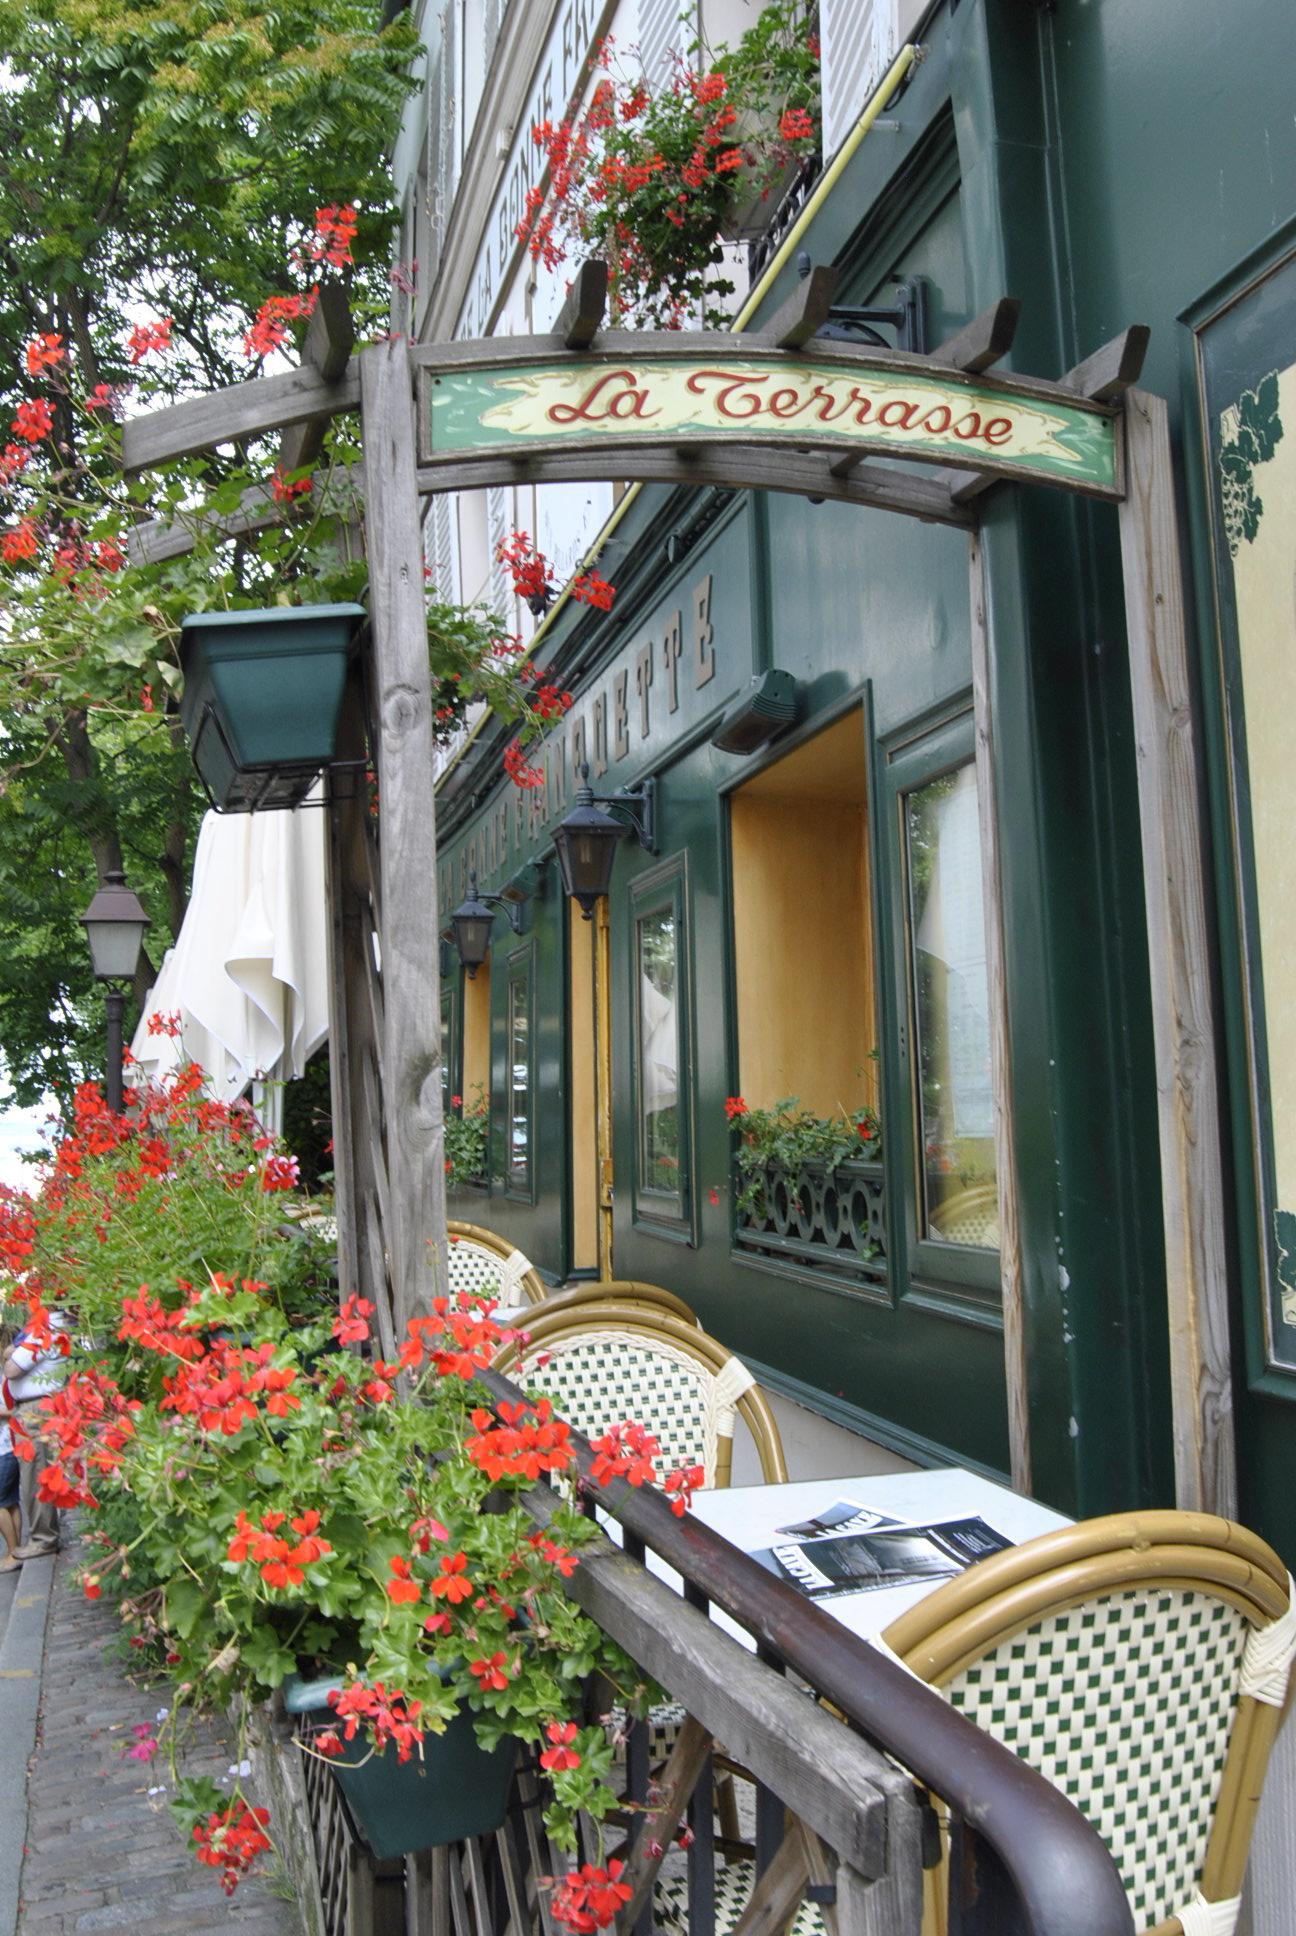 la terrasse paris restuarant my parisian lifemy parisian life. Black Bedroom Furniture Sets. Home Design Ideas